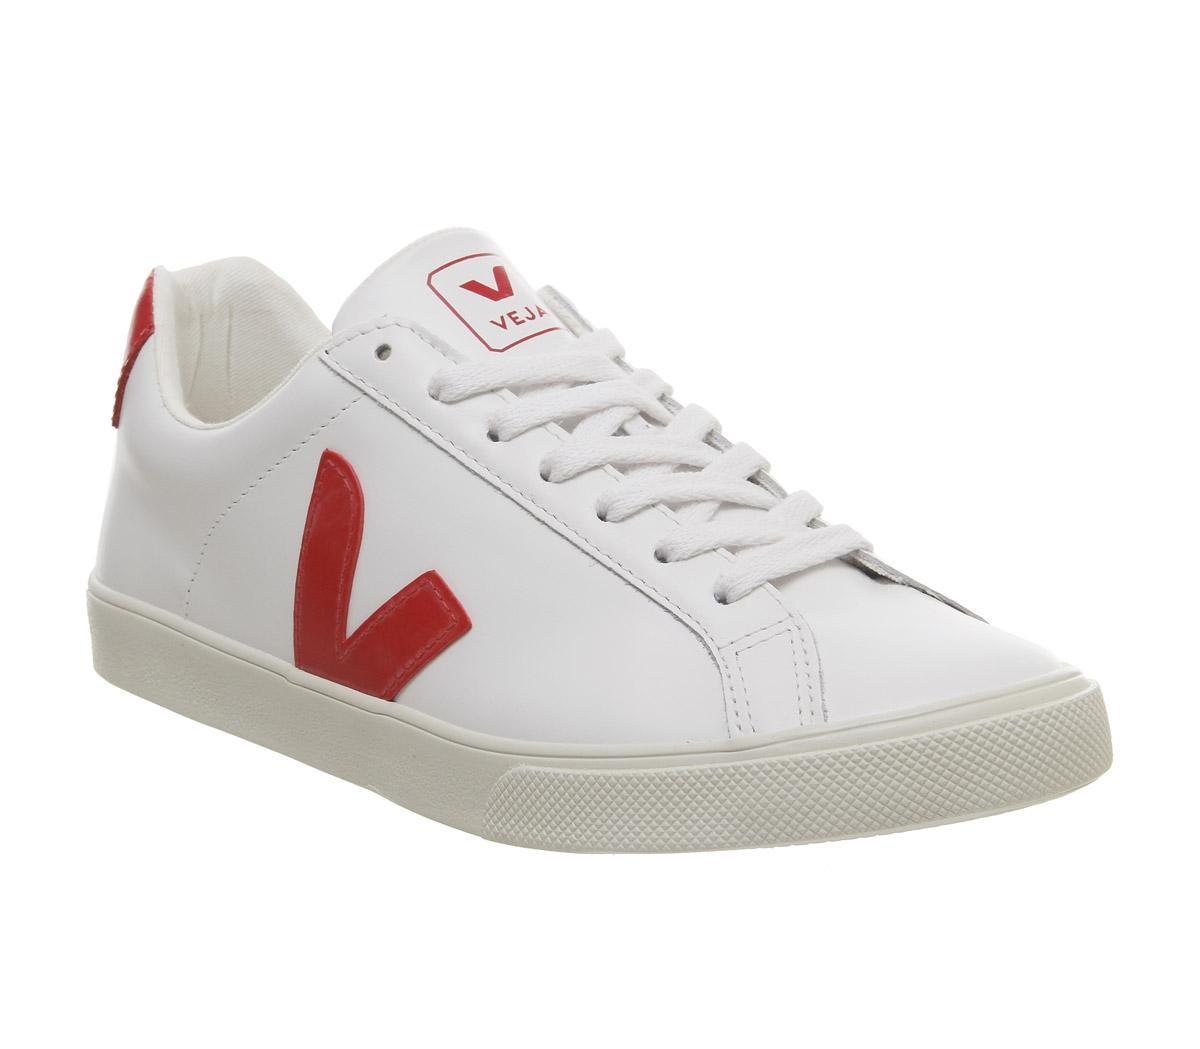 Veja Esplar Trainers White Red F - Hers